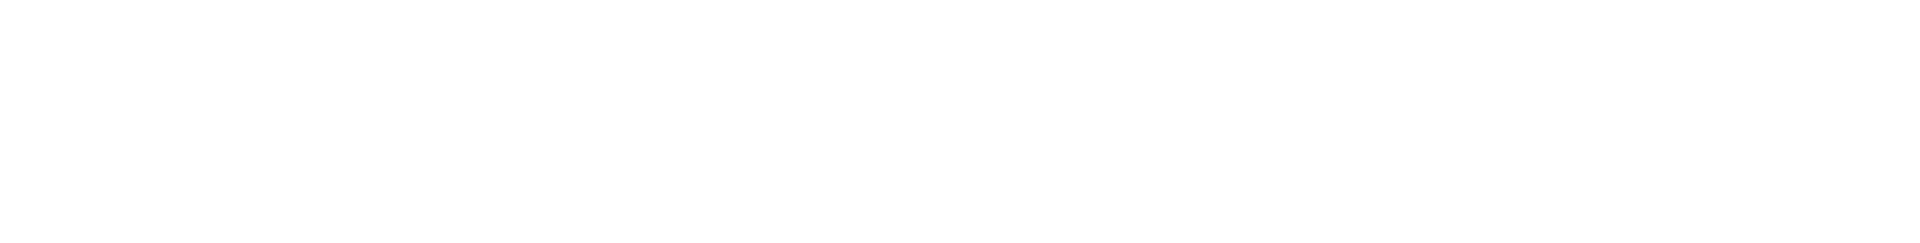 White Brush Effect